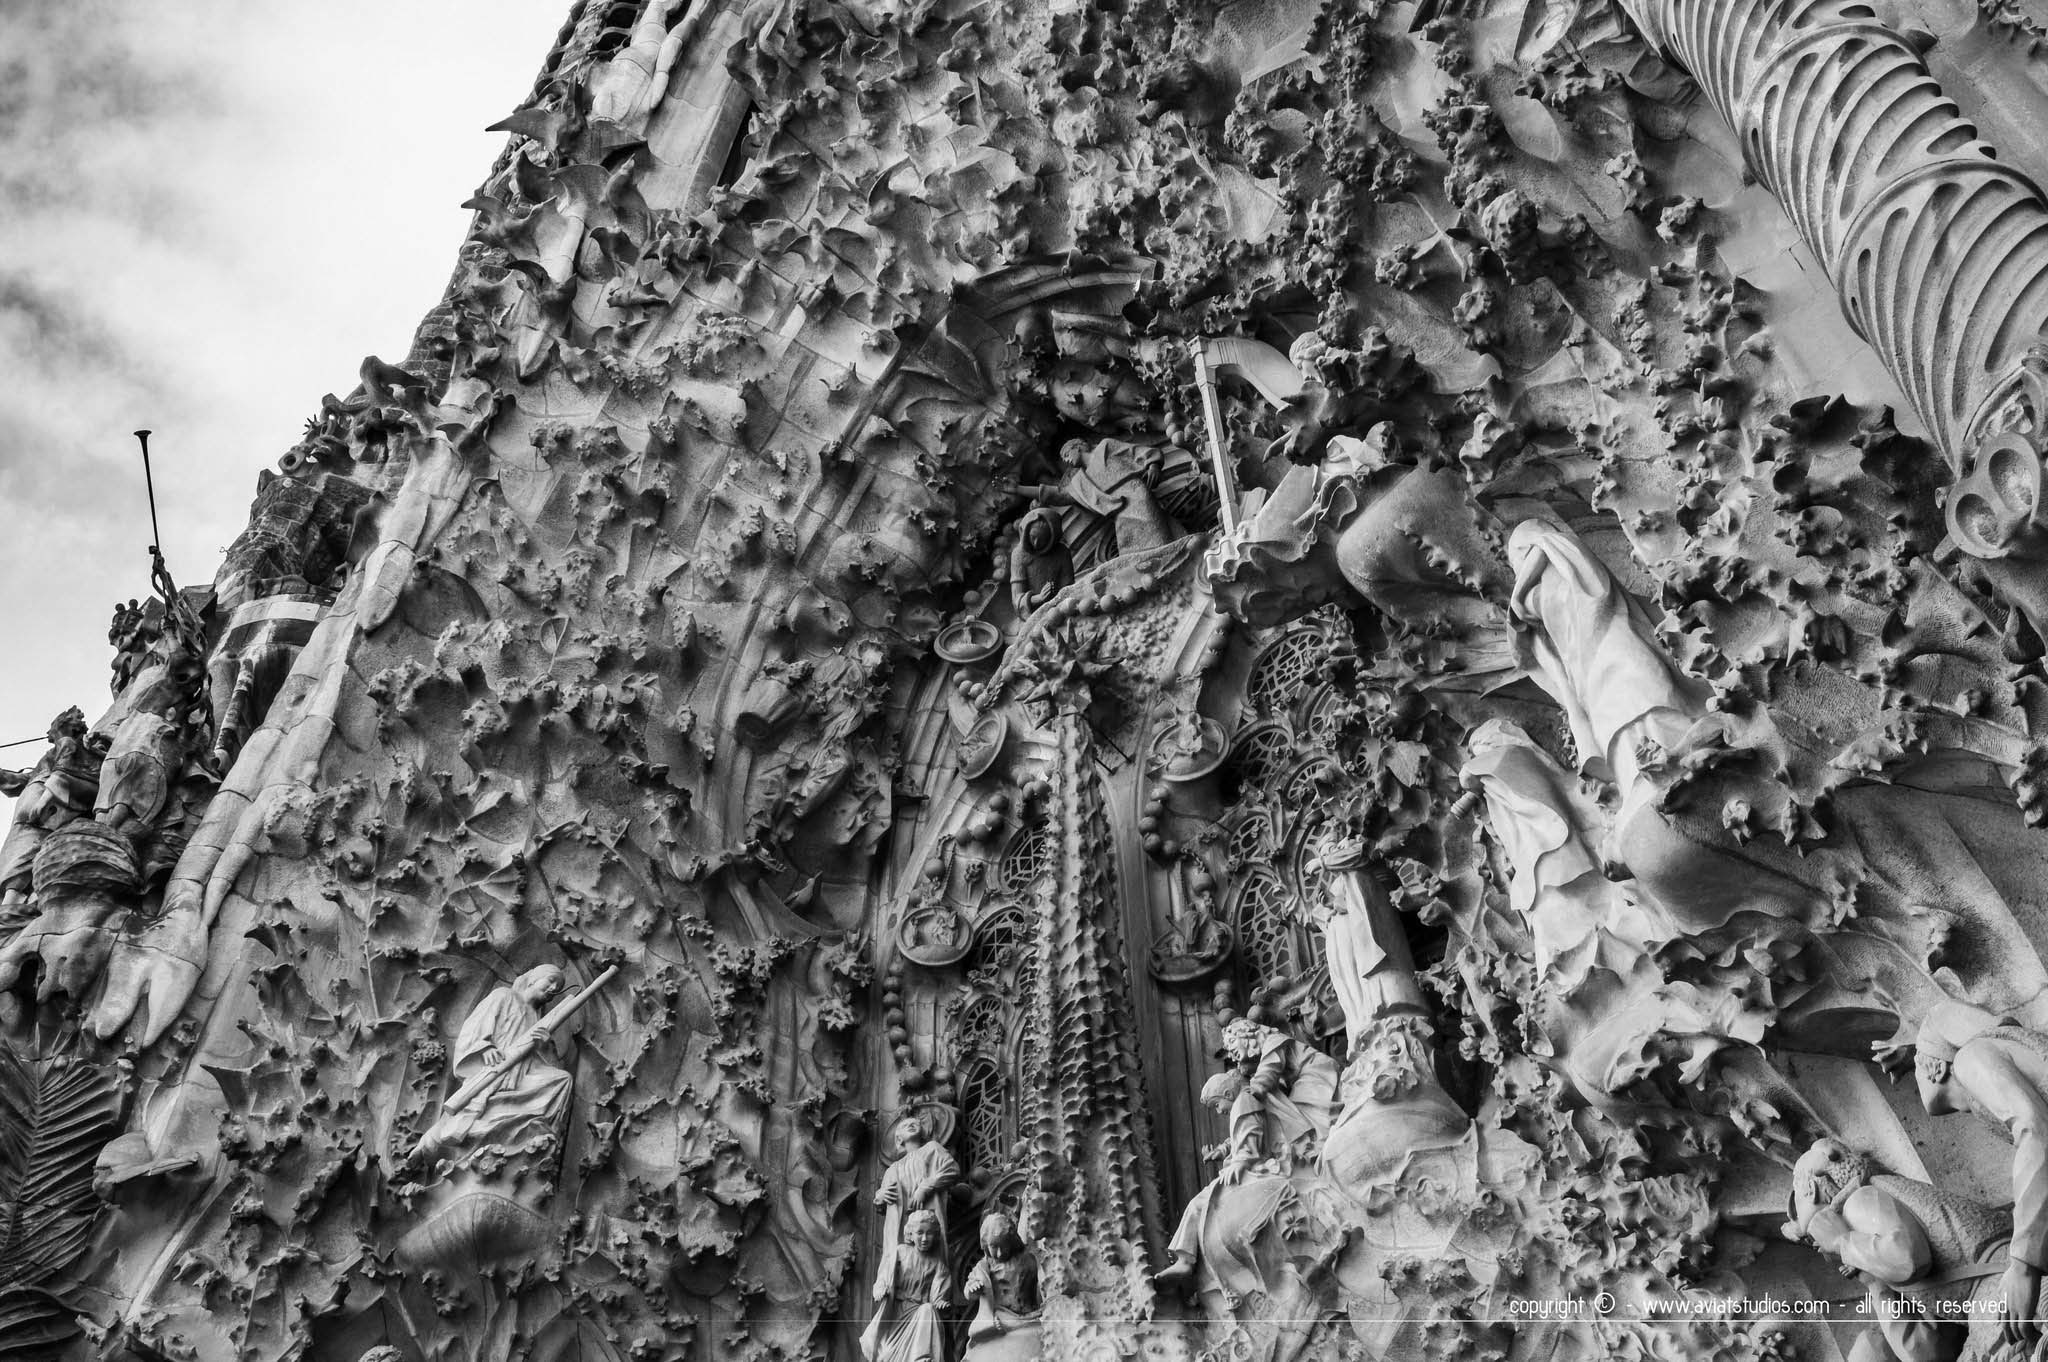 Détail de la façade extérieure de la Sagrada Familia.